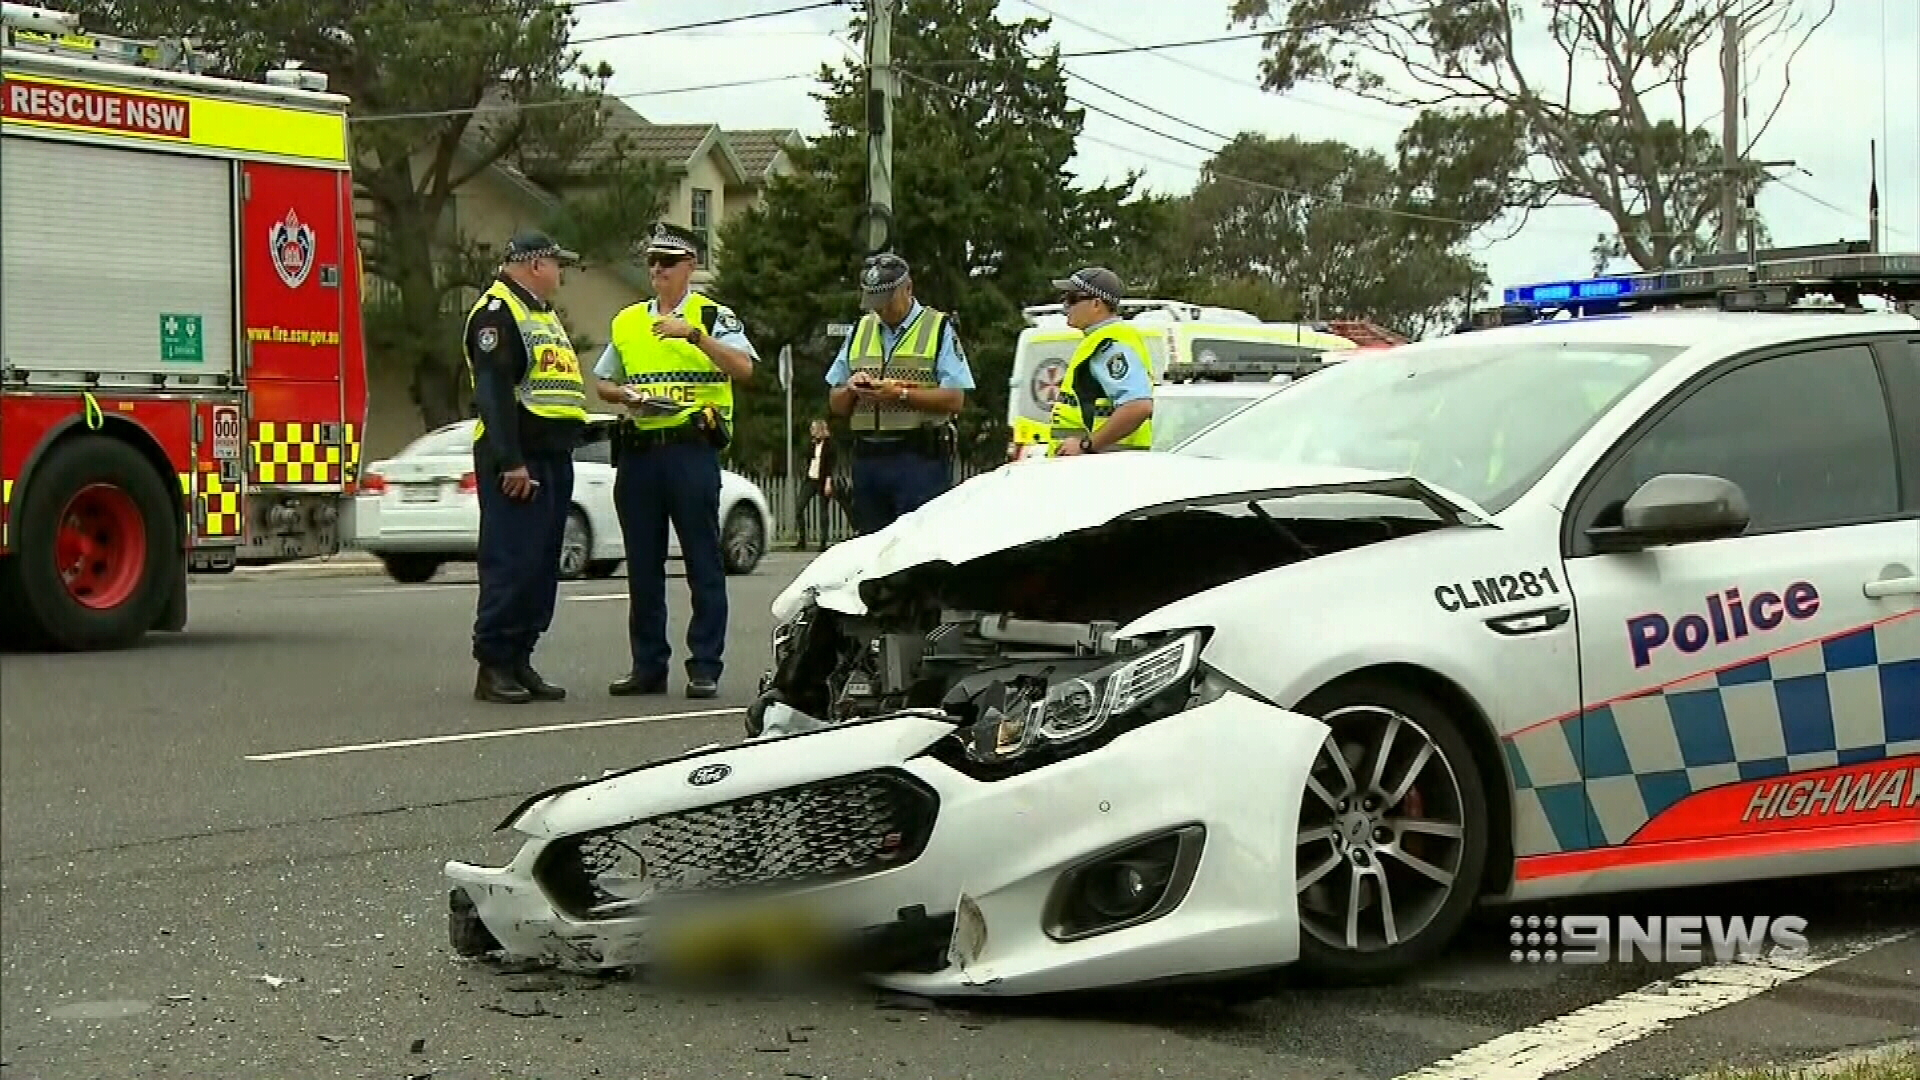 cronulla: woman critical police car crash mercedes